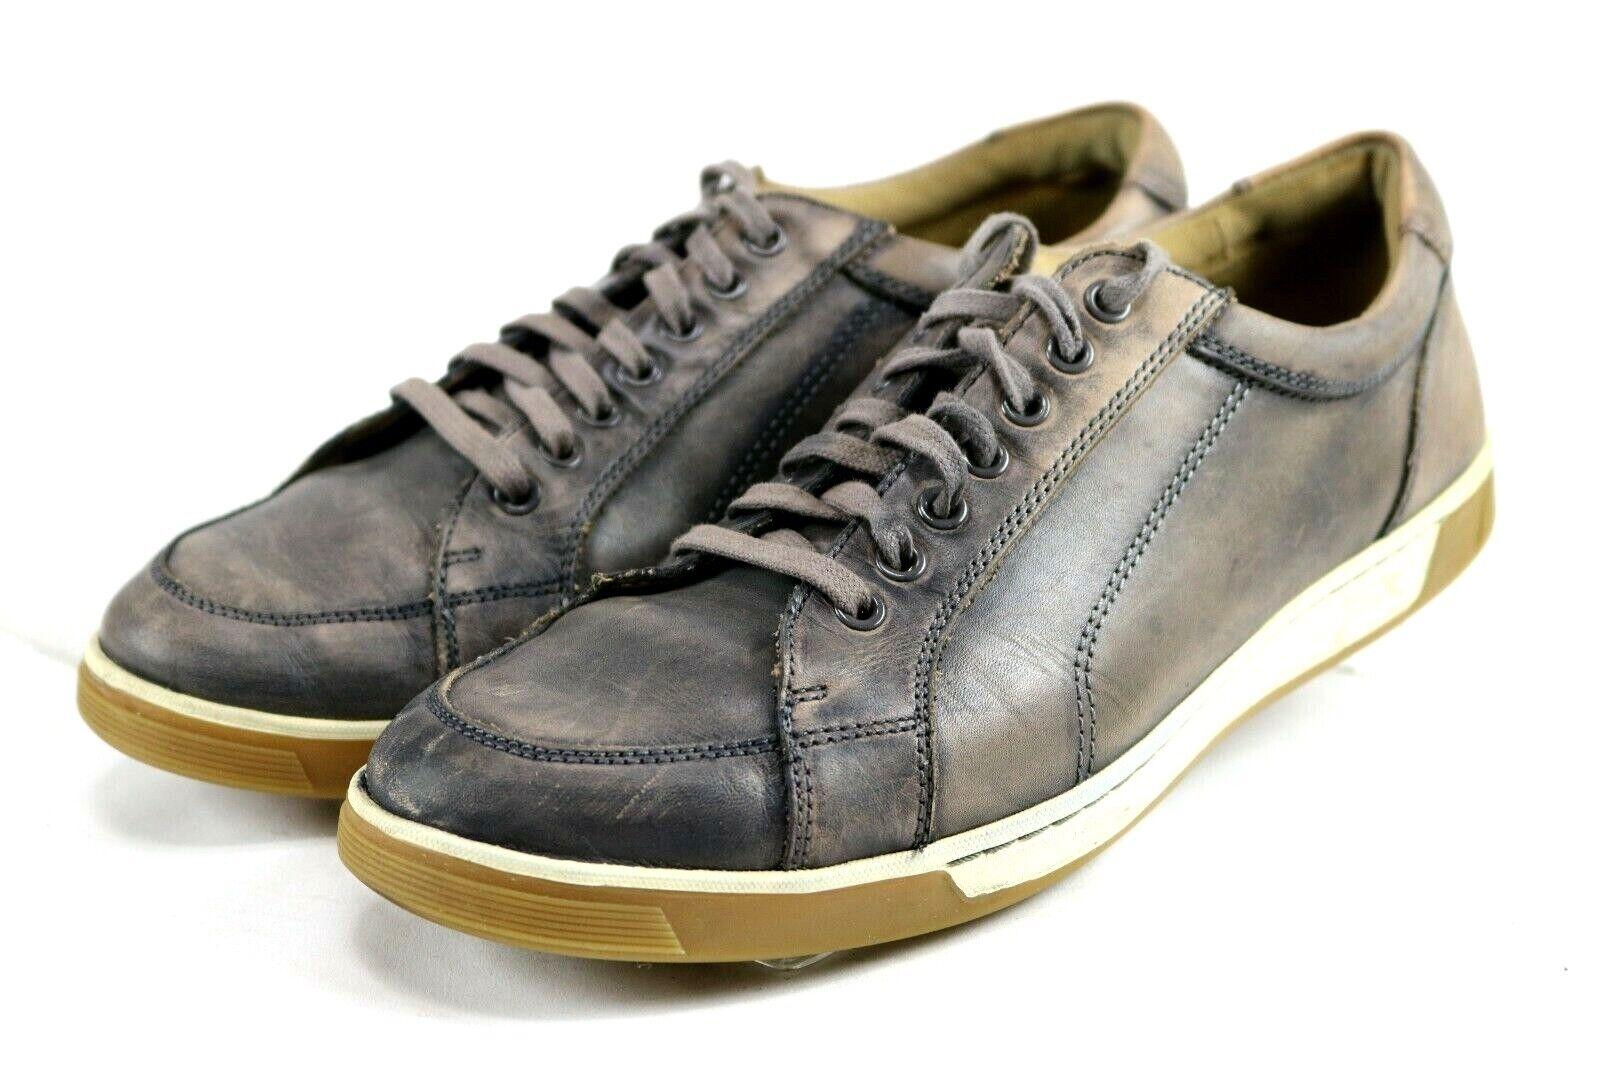 Cole Haan Vartan Sport Sneaker  128 Men's Oxford shoes Size 9.5 Brown Leather